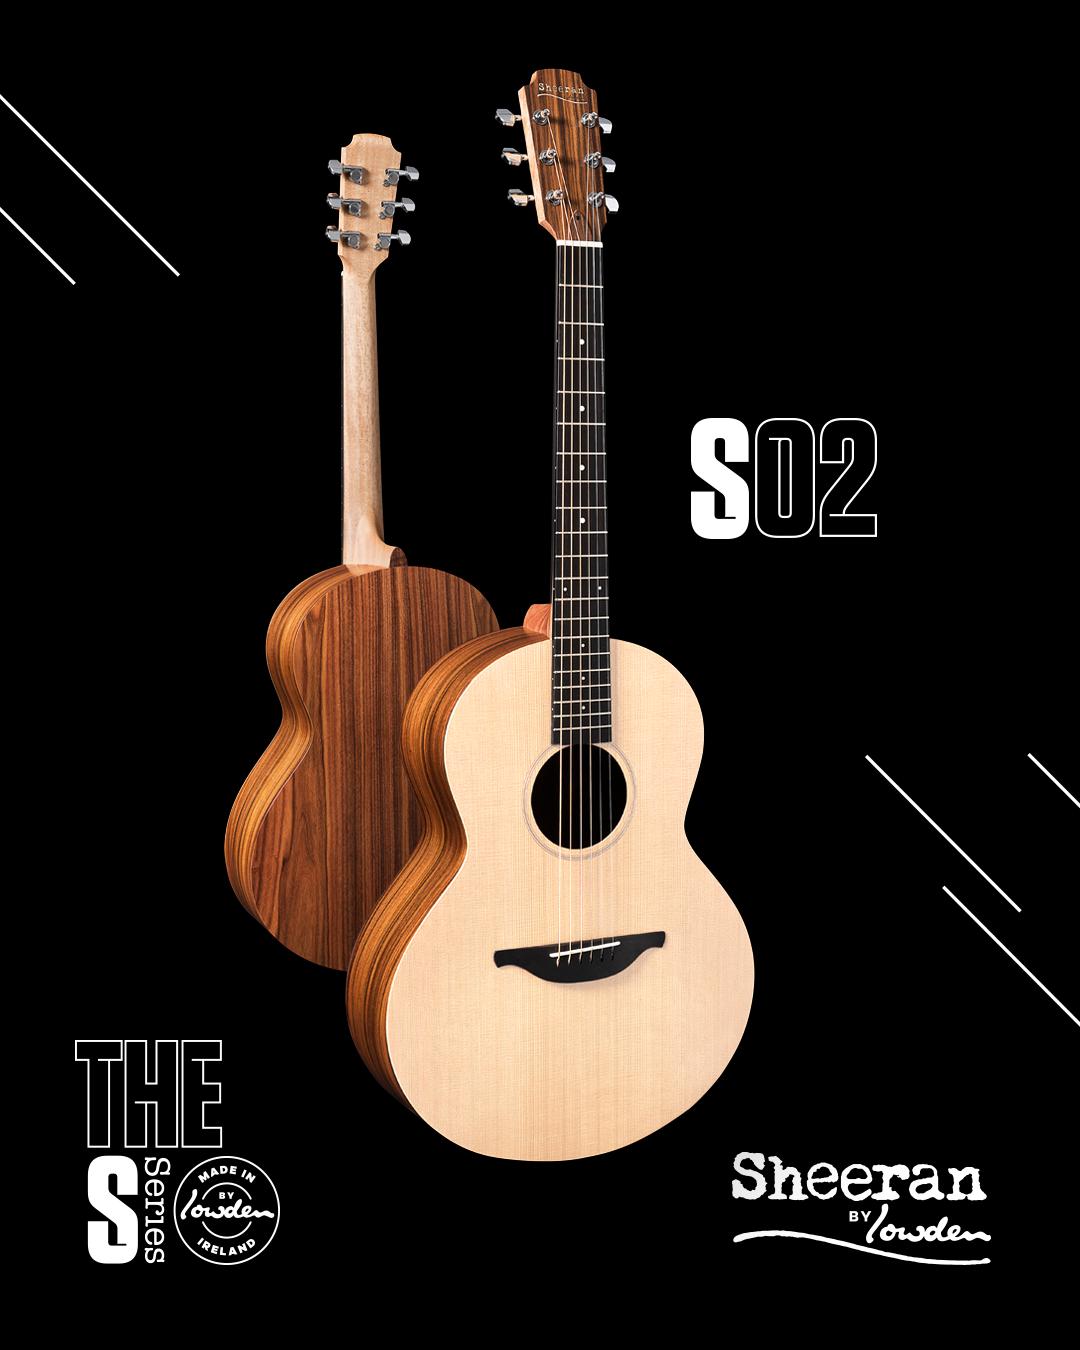 Sheeran S02 PRE ORDER